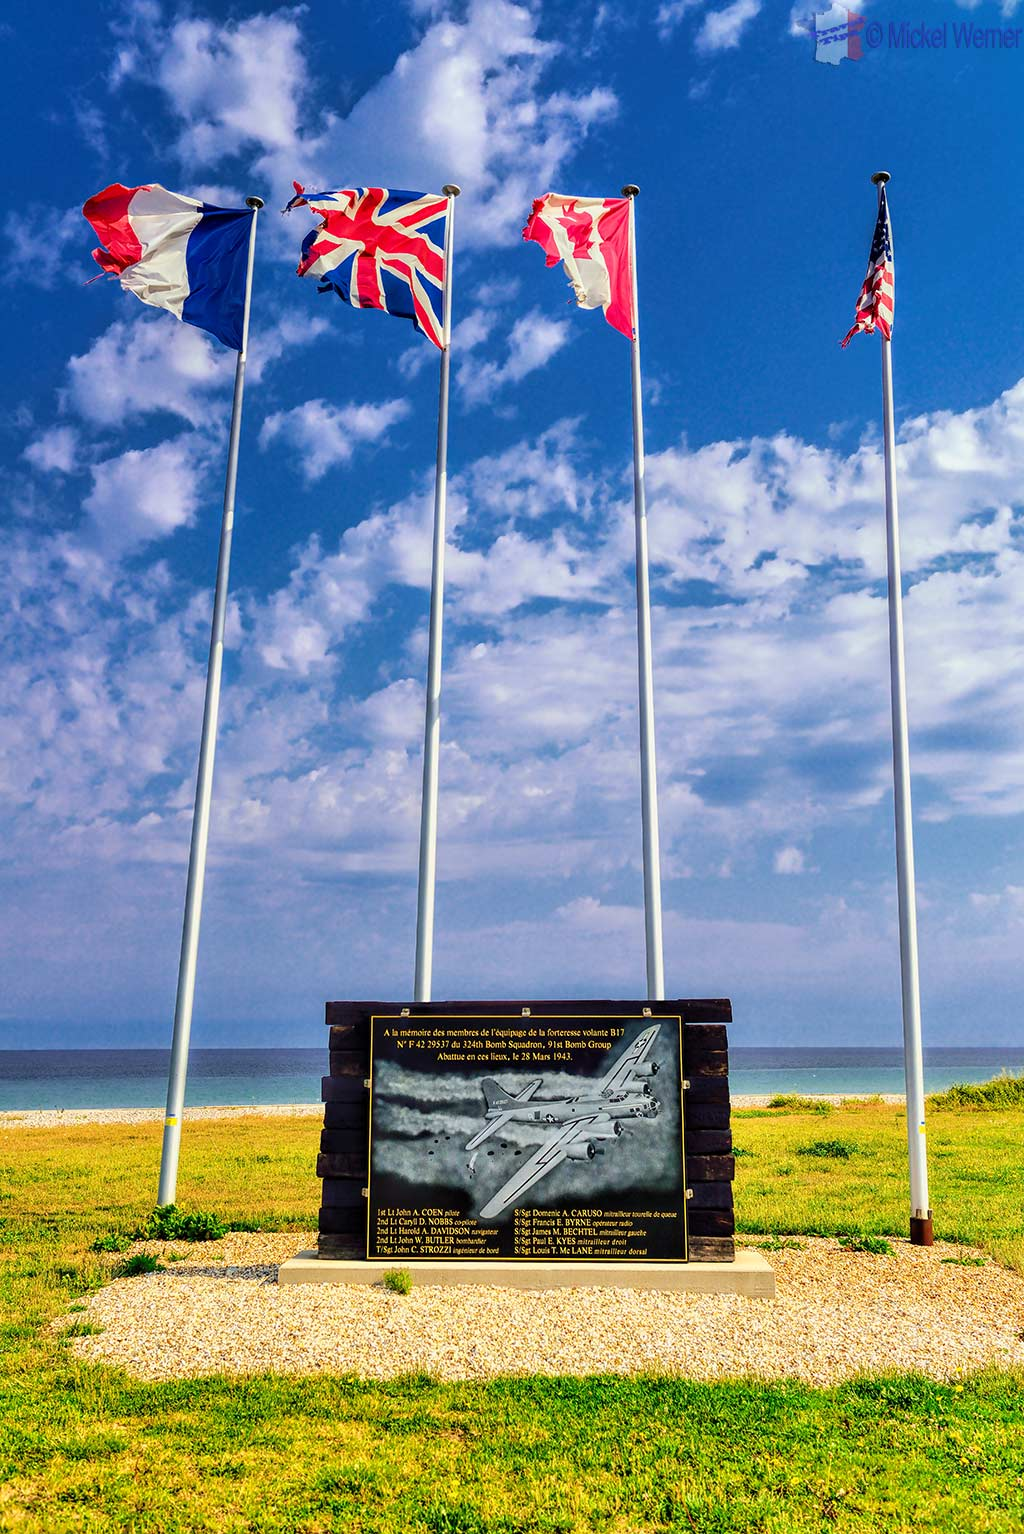 War Memorial at Veulettes-sur-Mer, Normandy